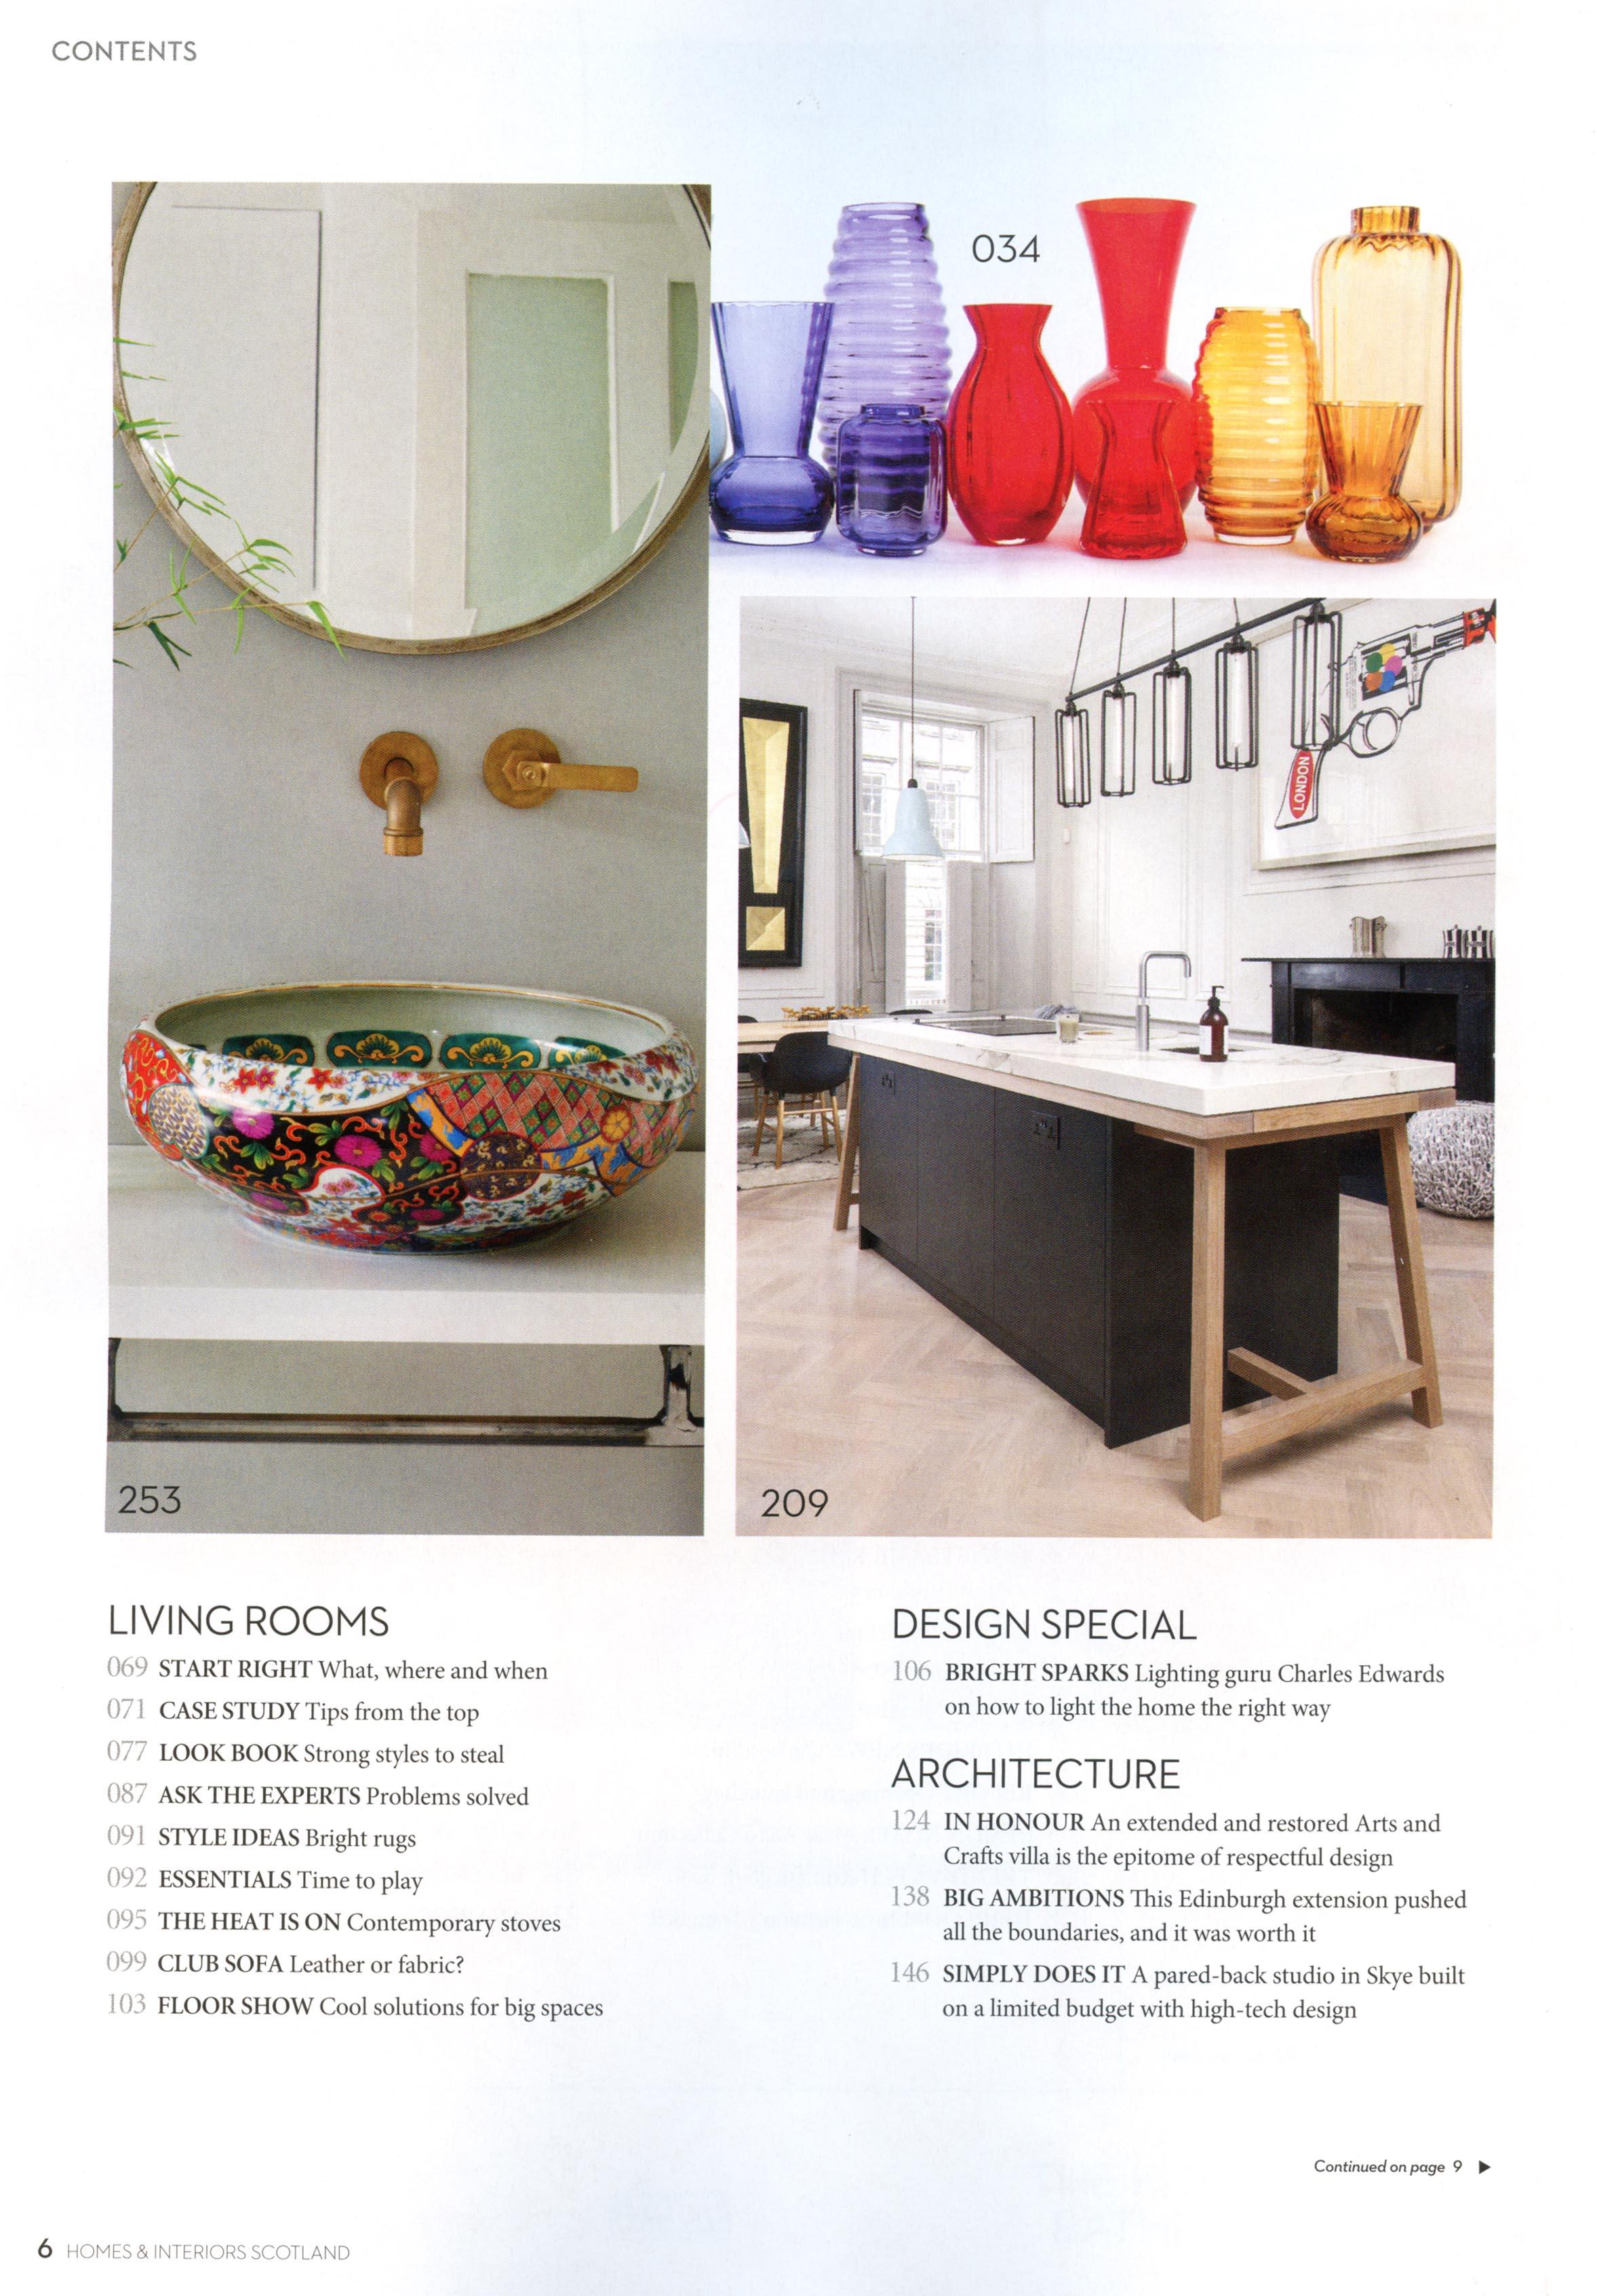 Good Homes - 10 ways to Add Space Light Value - September 2016 LBC.jpg